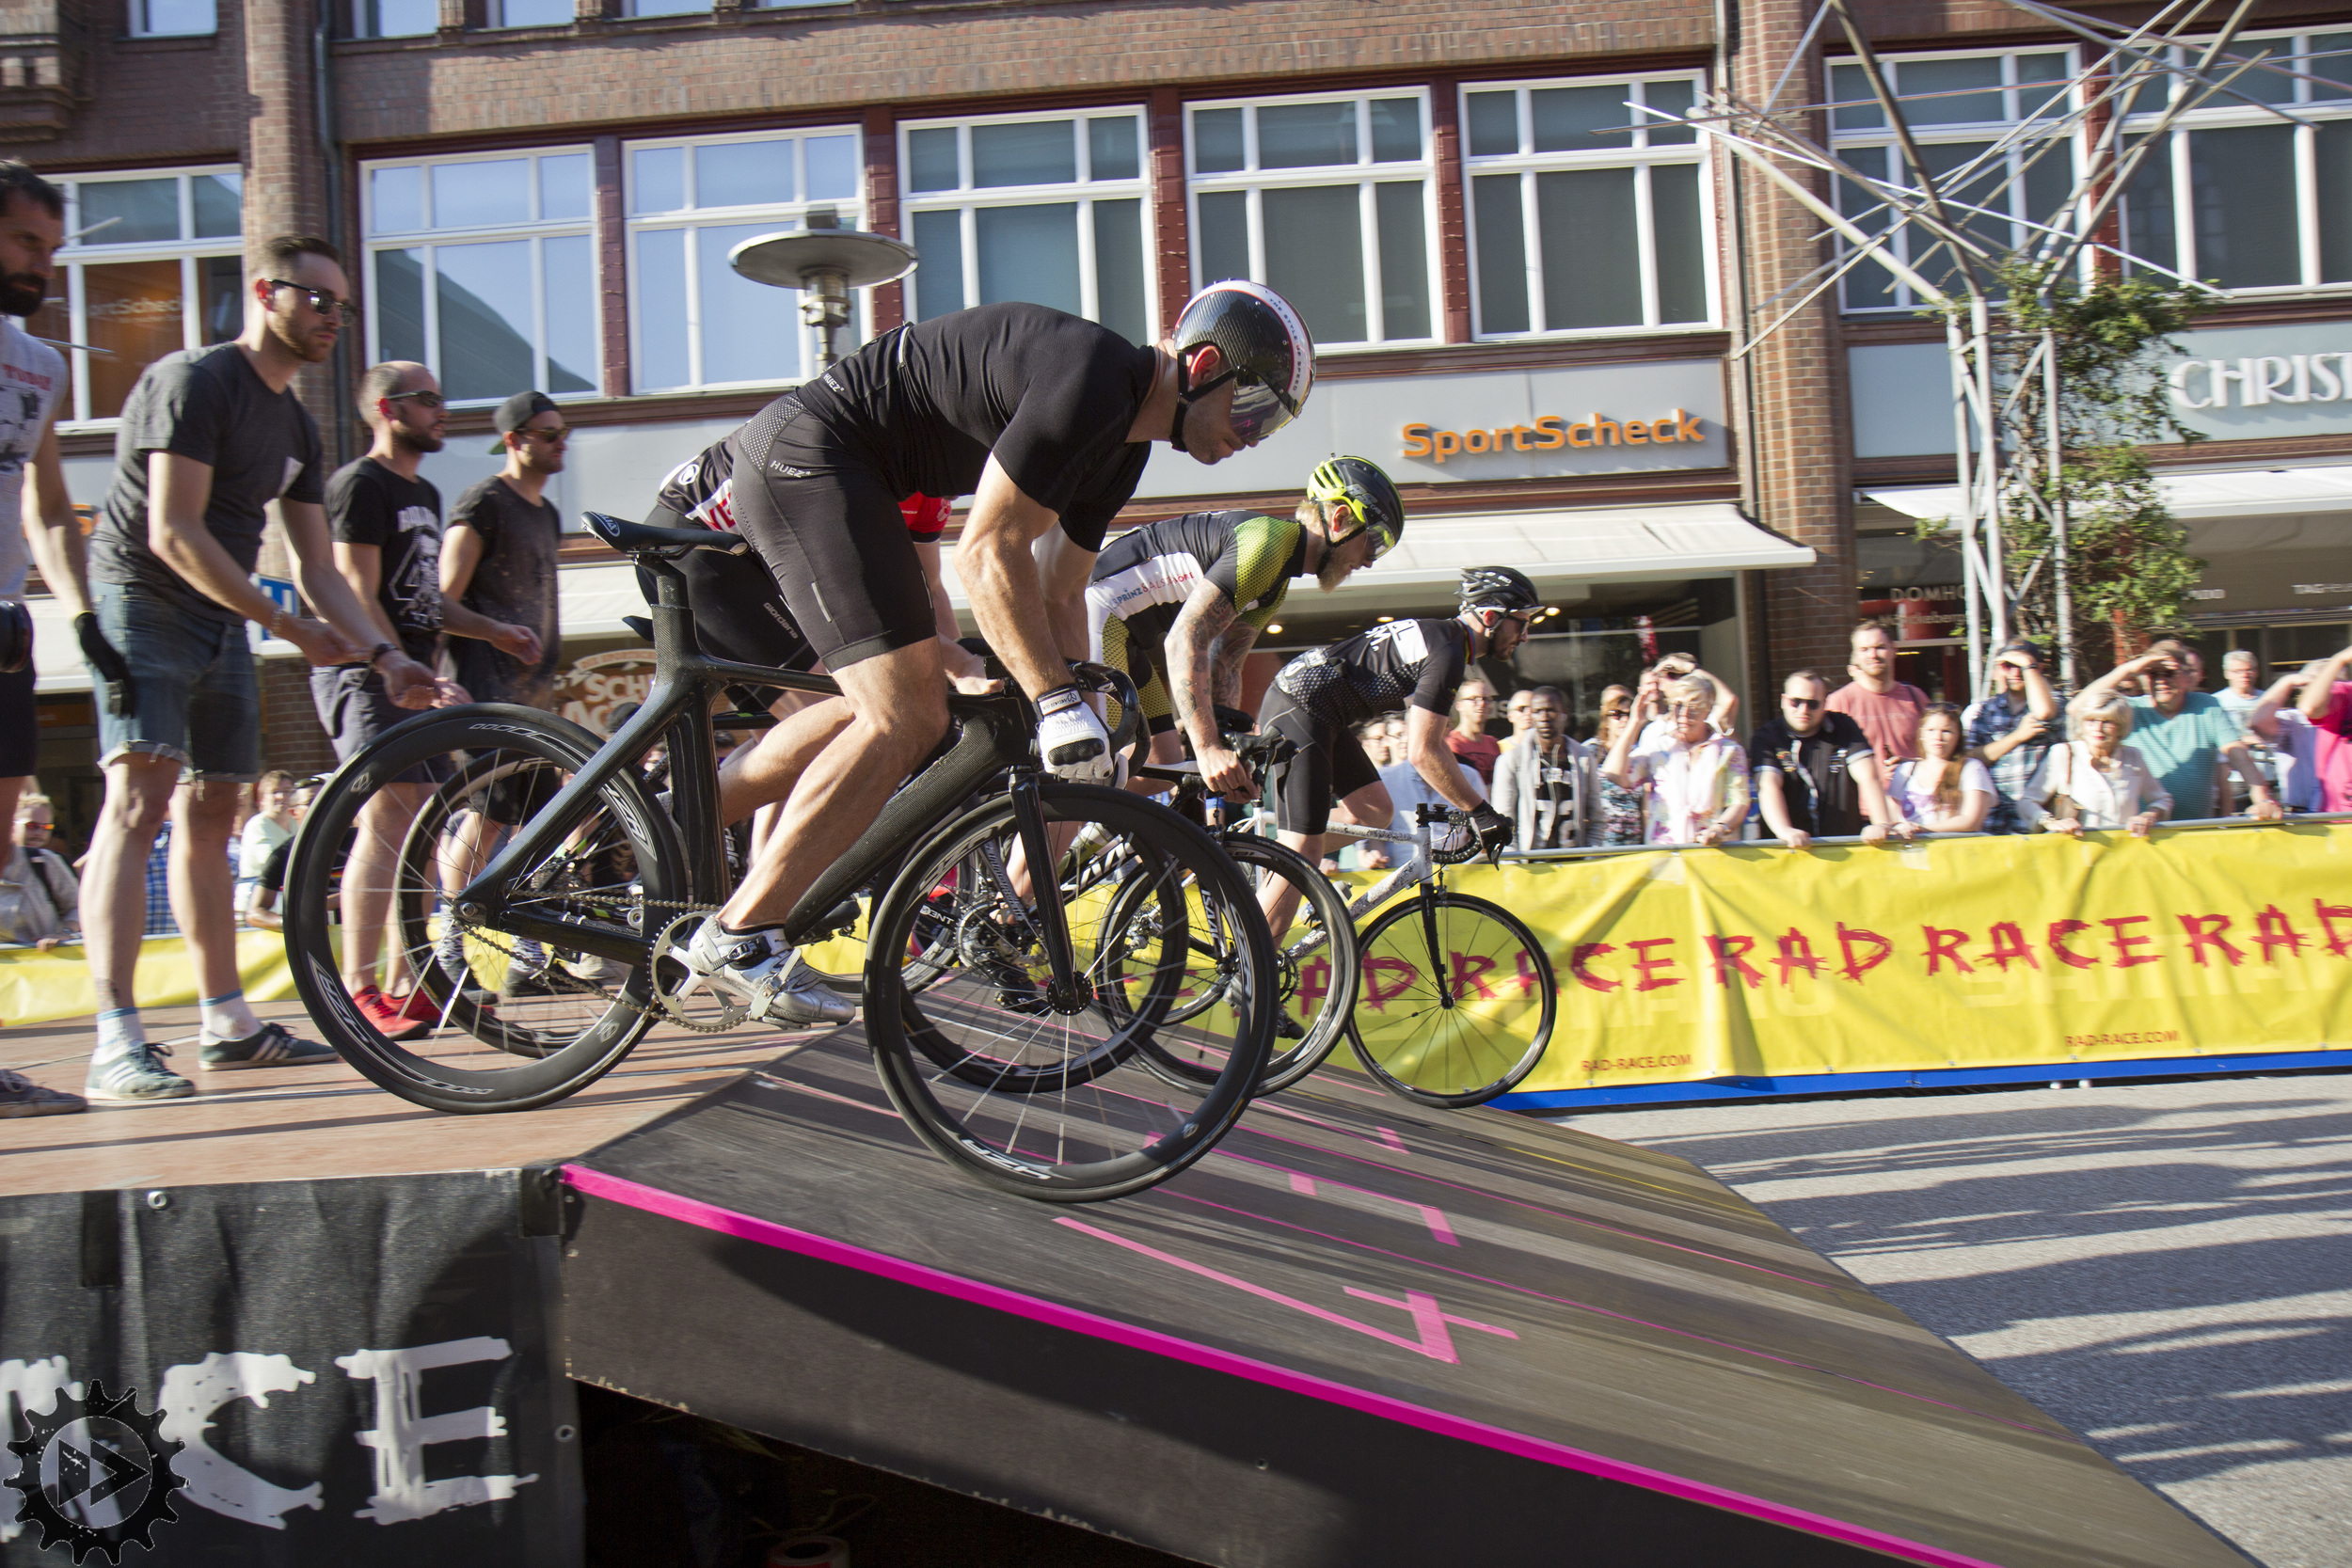 RAD RACE BATTLE - Cyclassics Hamburg 2015 - Pic by FXD>>FWD Maike Lange_11.jpg